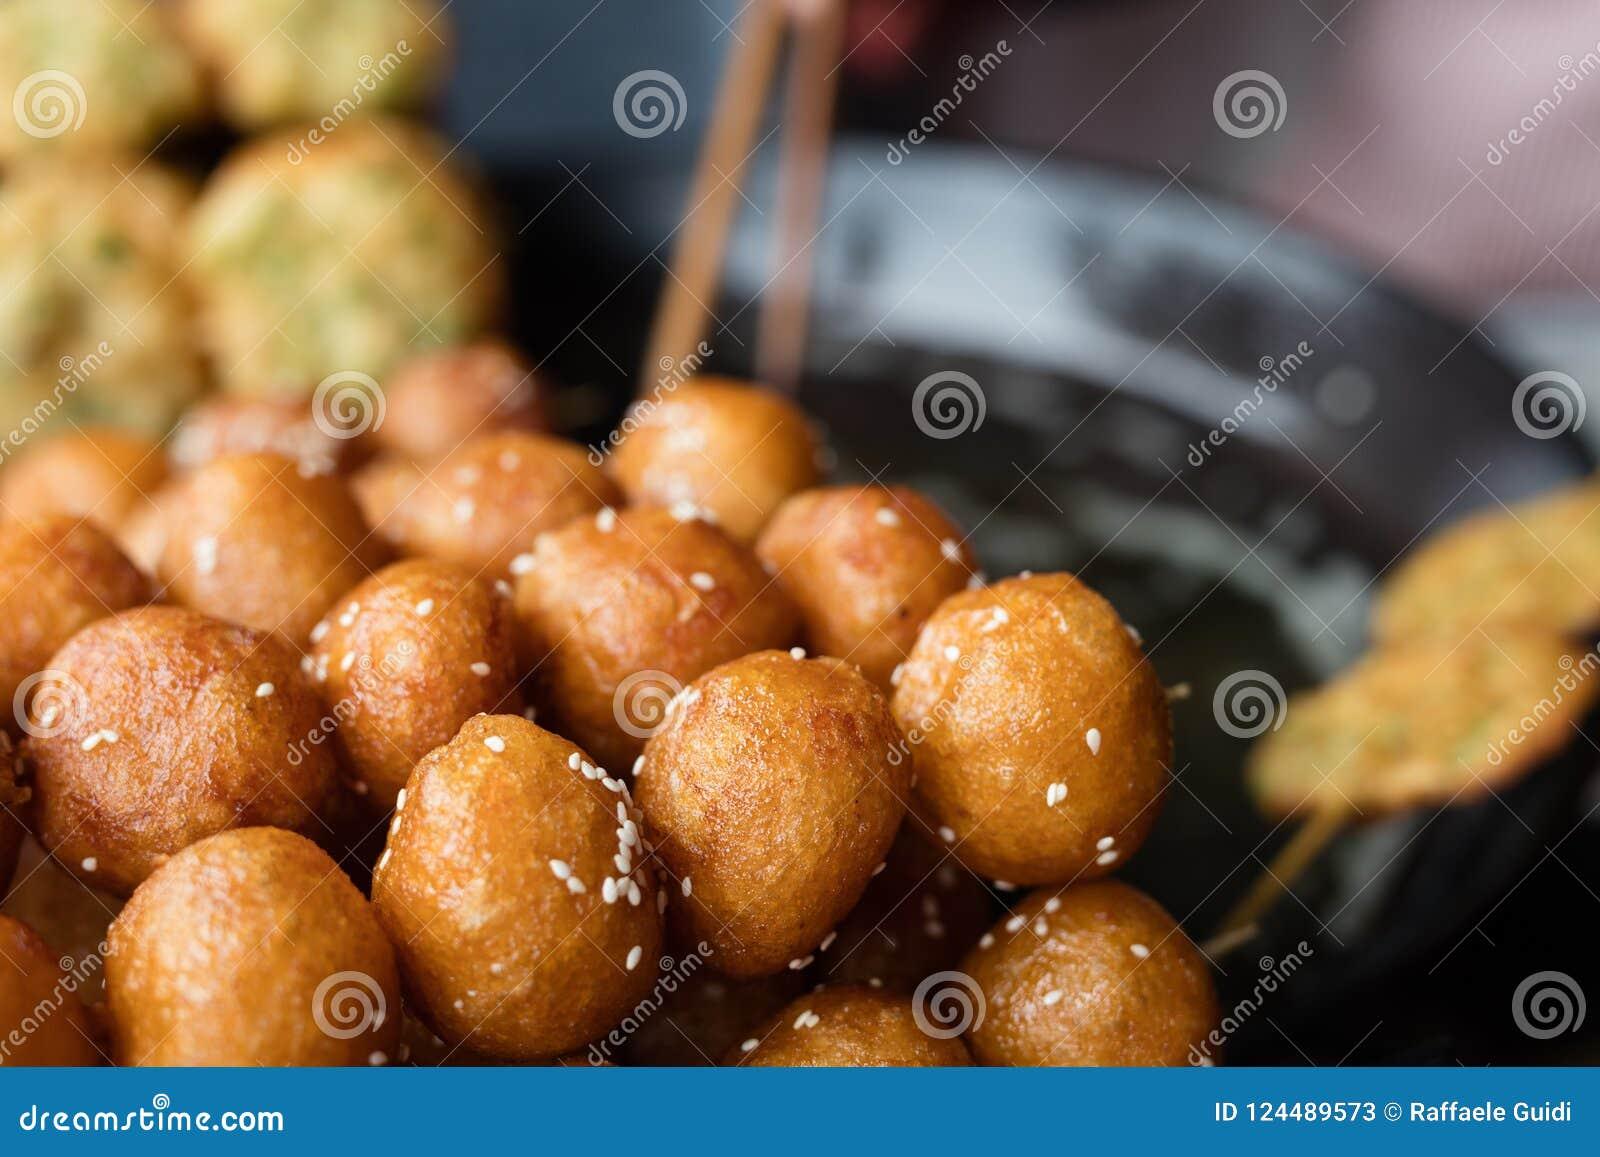 Deep fried sesame balls stock image  Image of asia, oriental - 124489573